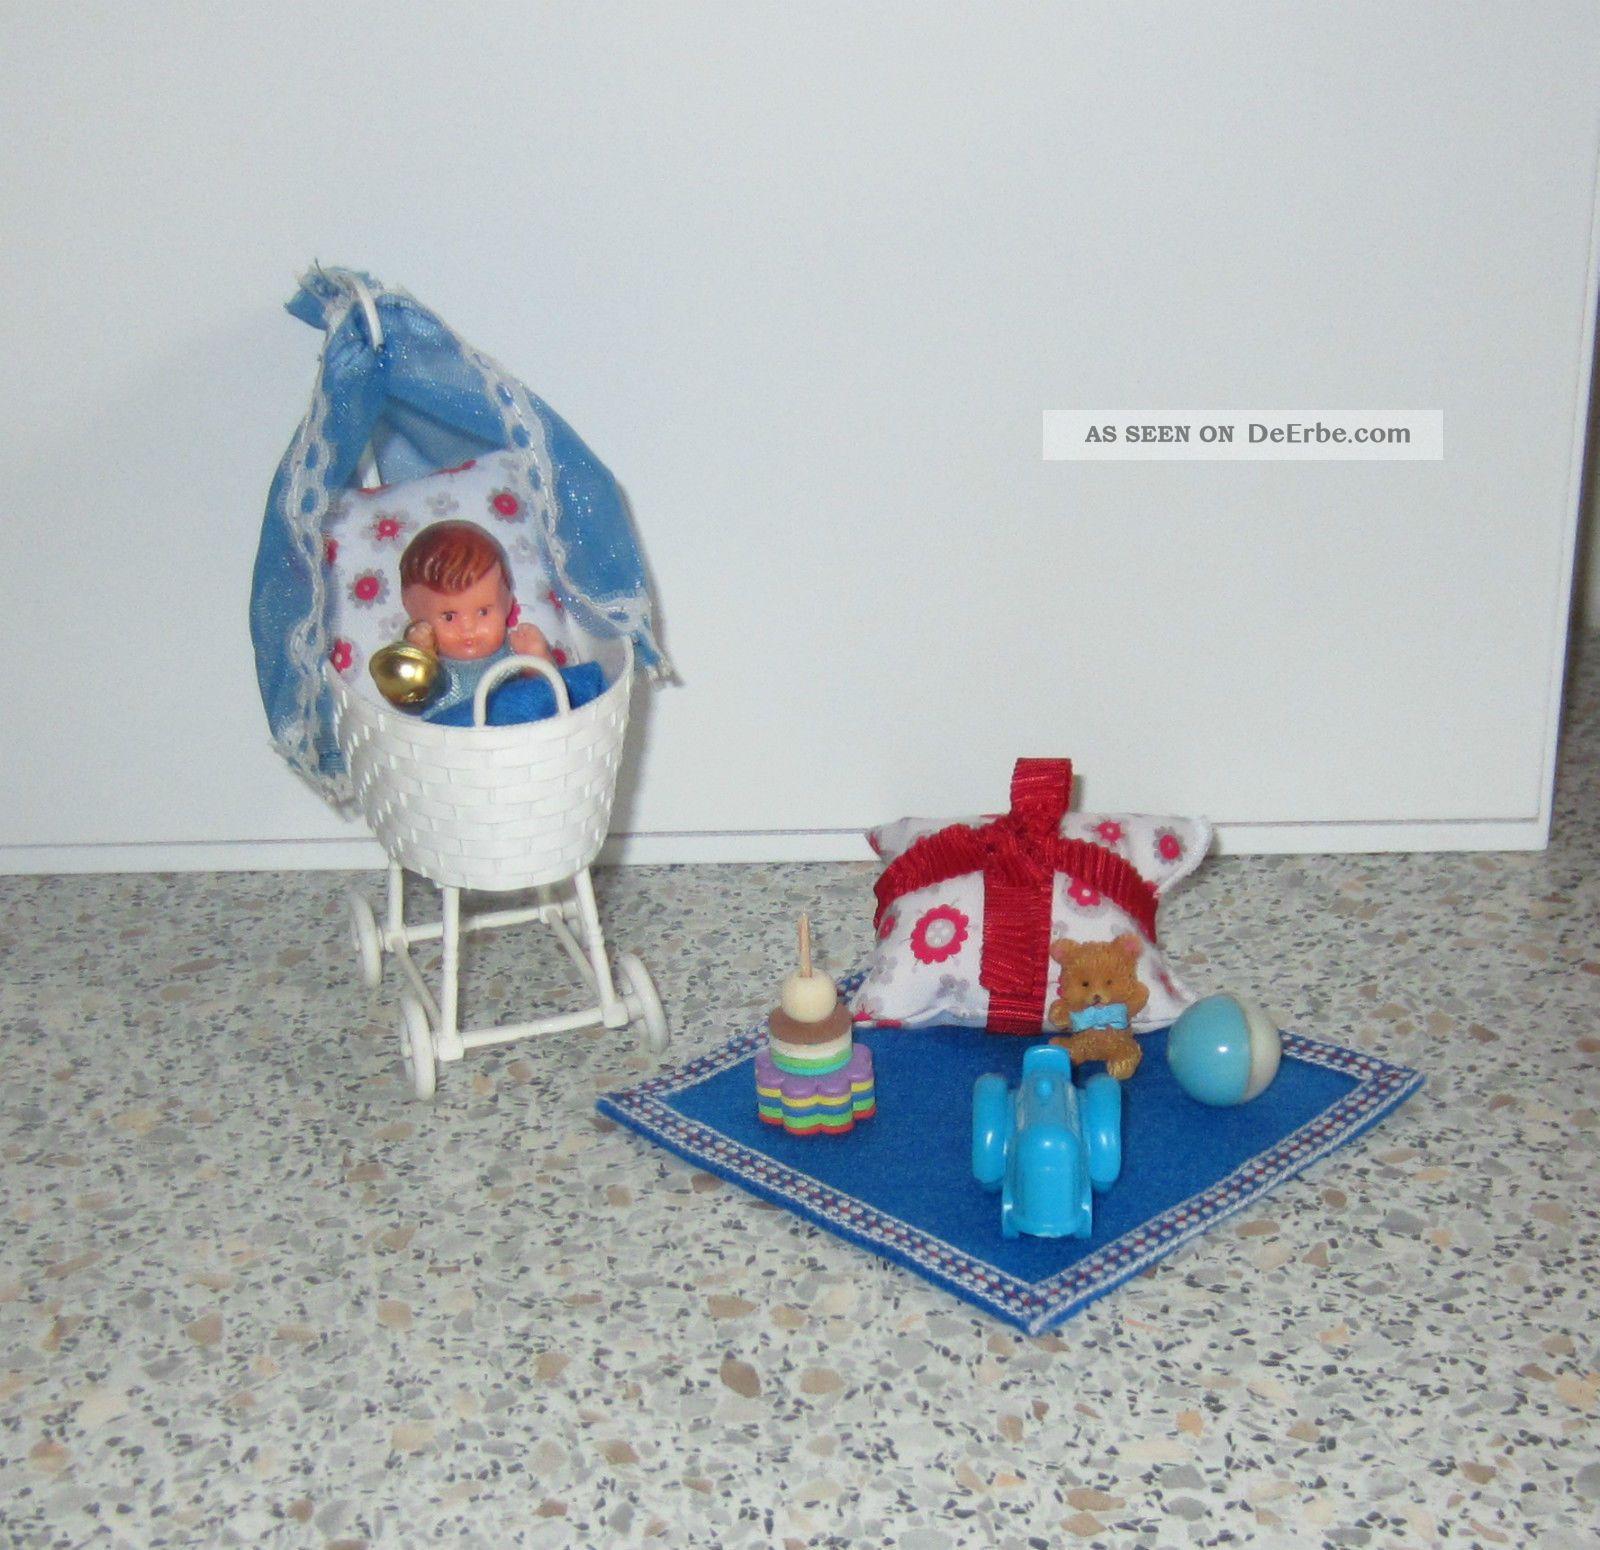 f r puppenstube puppenhaus puppen stubenwagen mit ari puppe. Black Bedroom Furniture Sets. Home Design Ideas